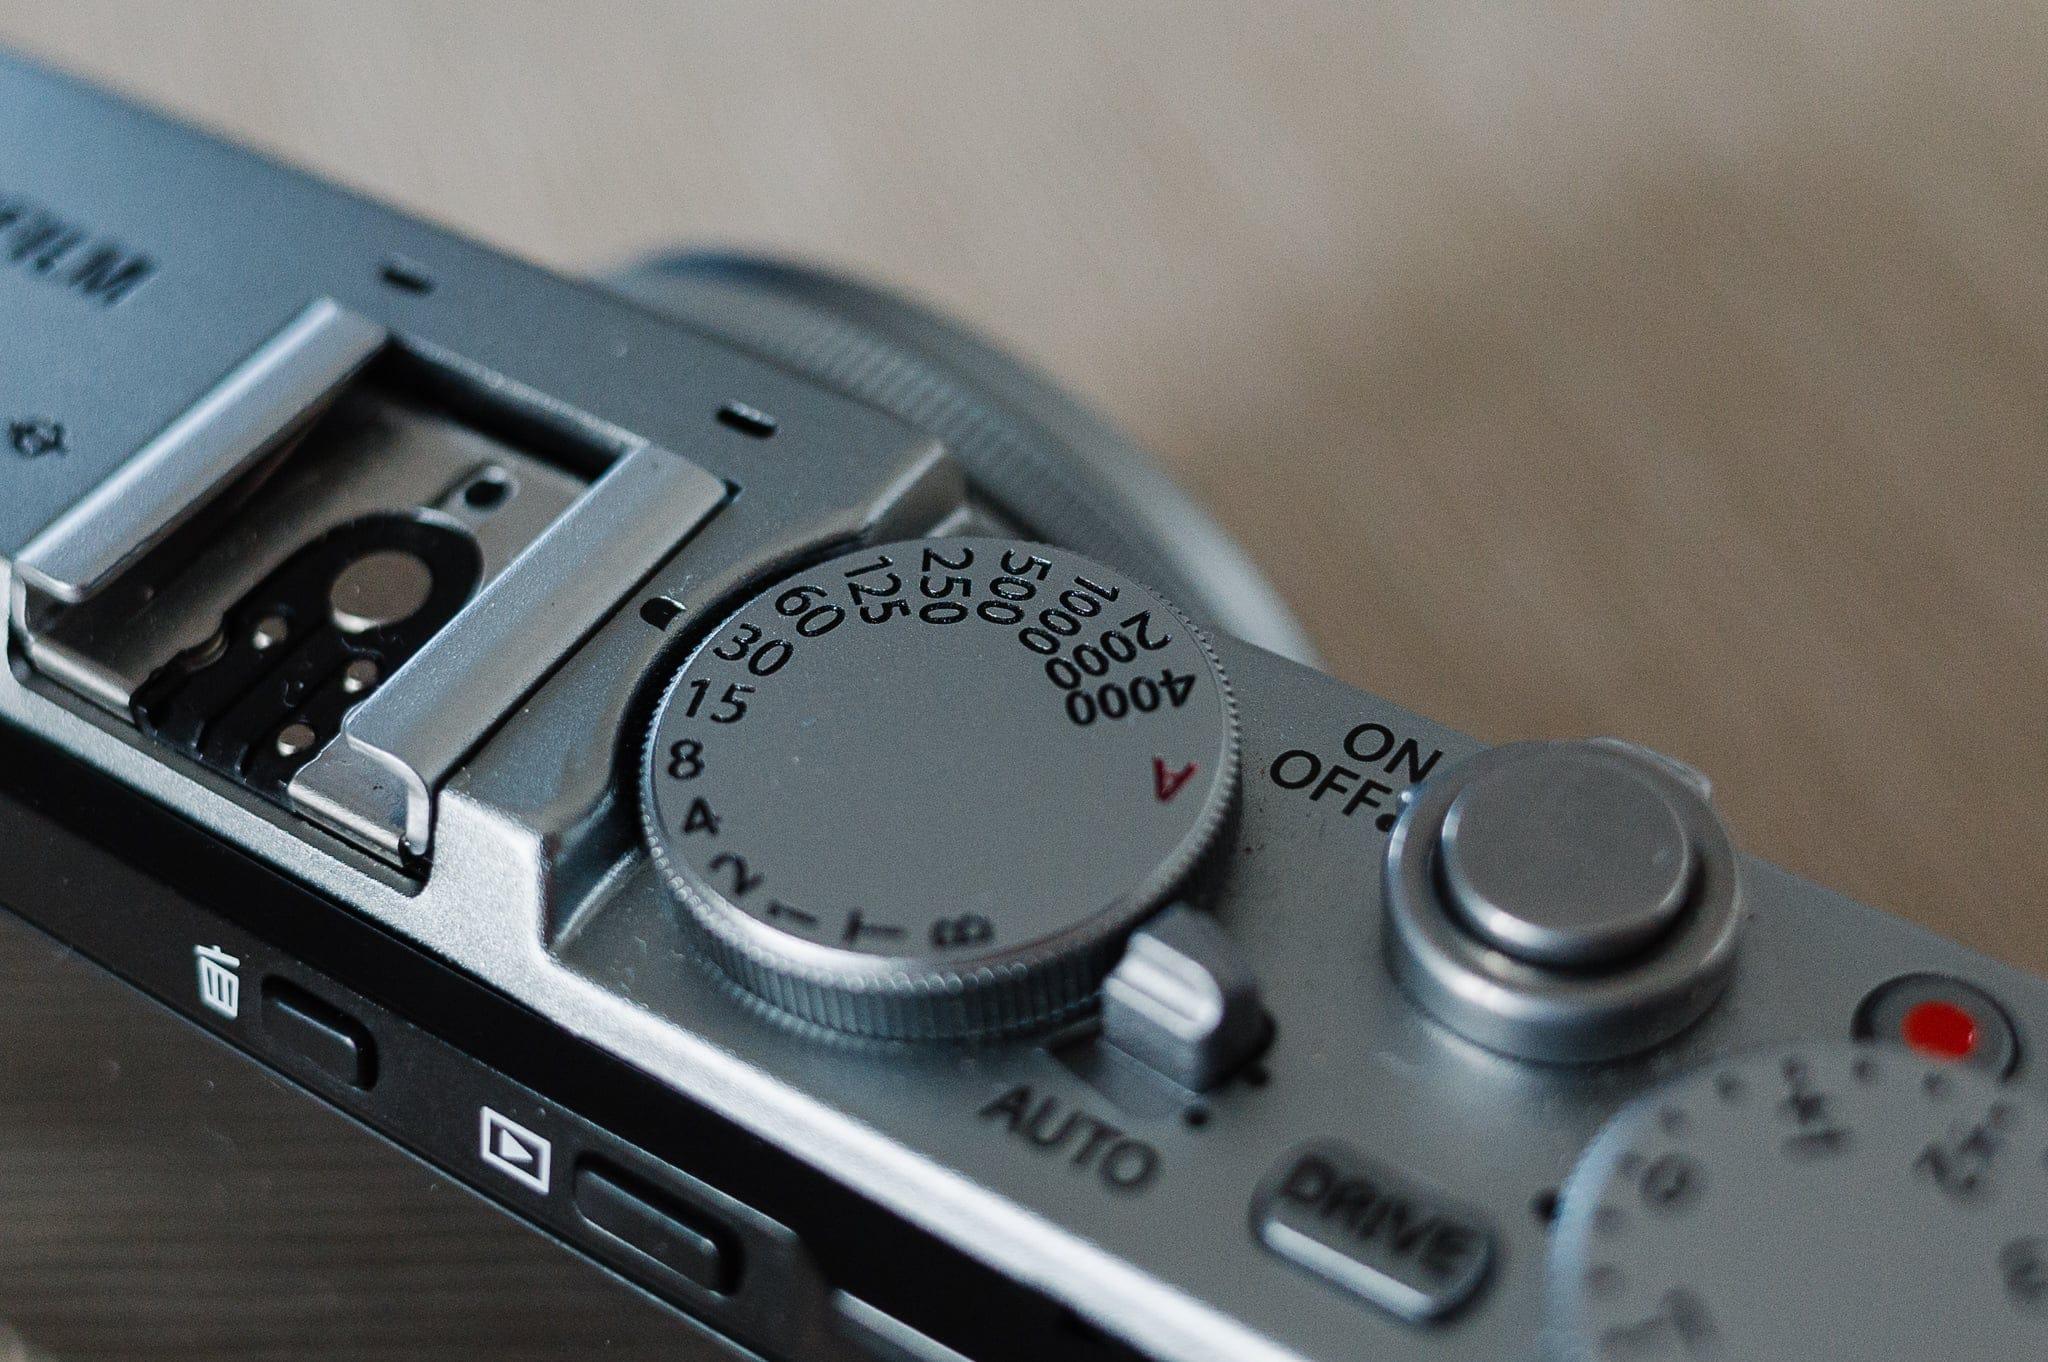 Fujifilm X70 product photo